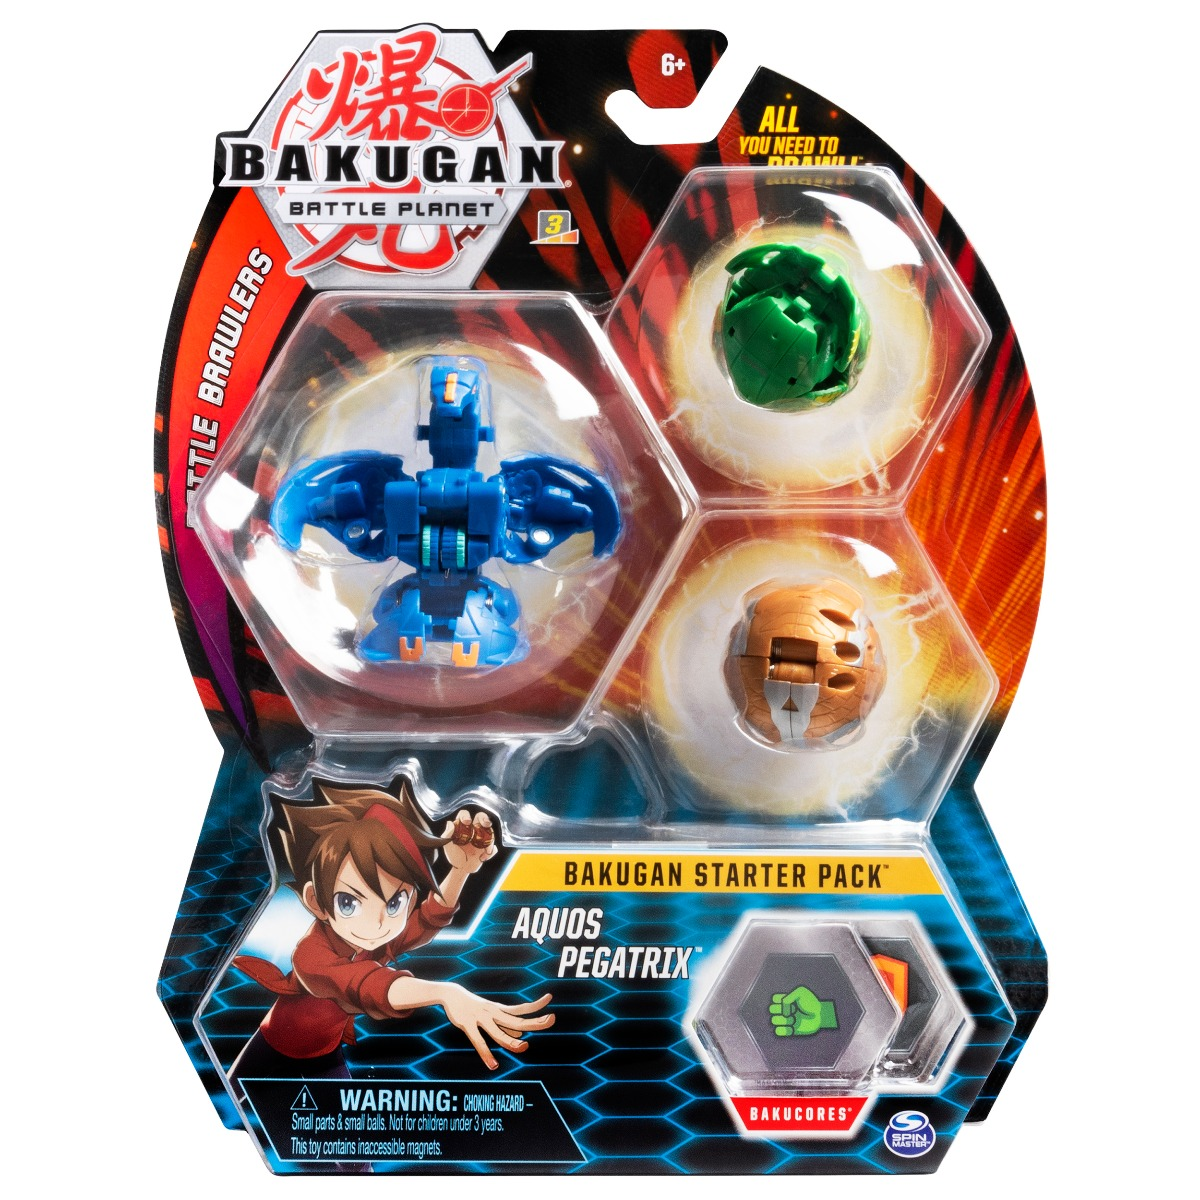 Set Bakugan Battle Planet Starter Pack Aquos Pegatrix, 20109155